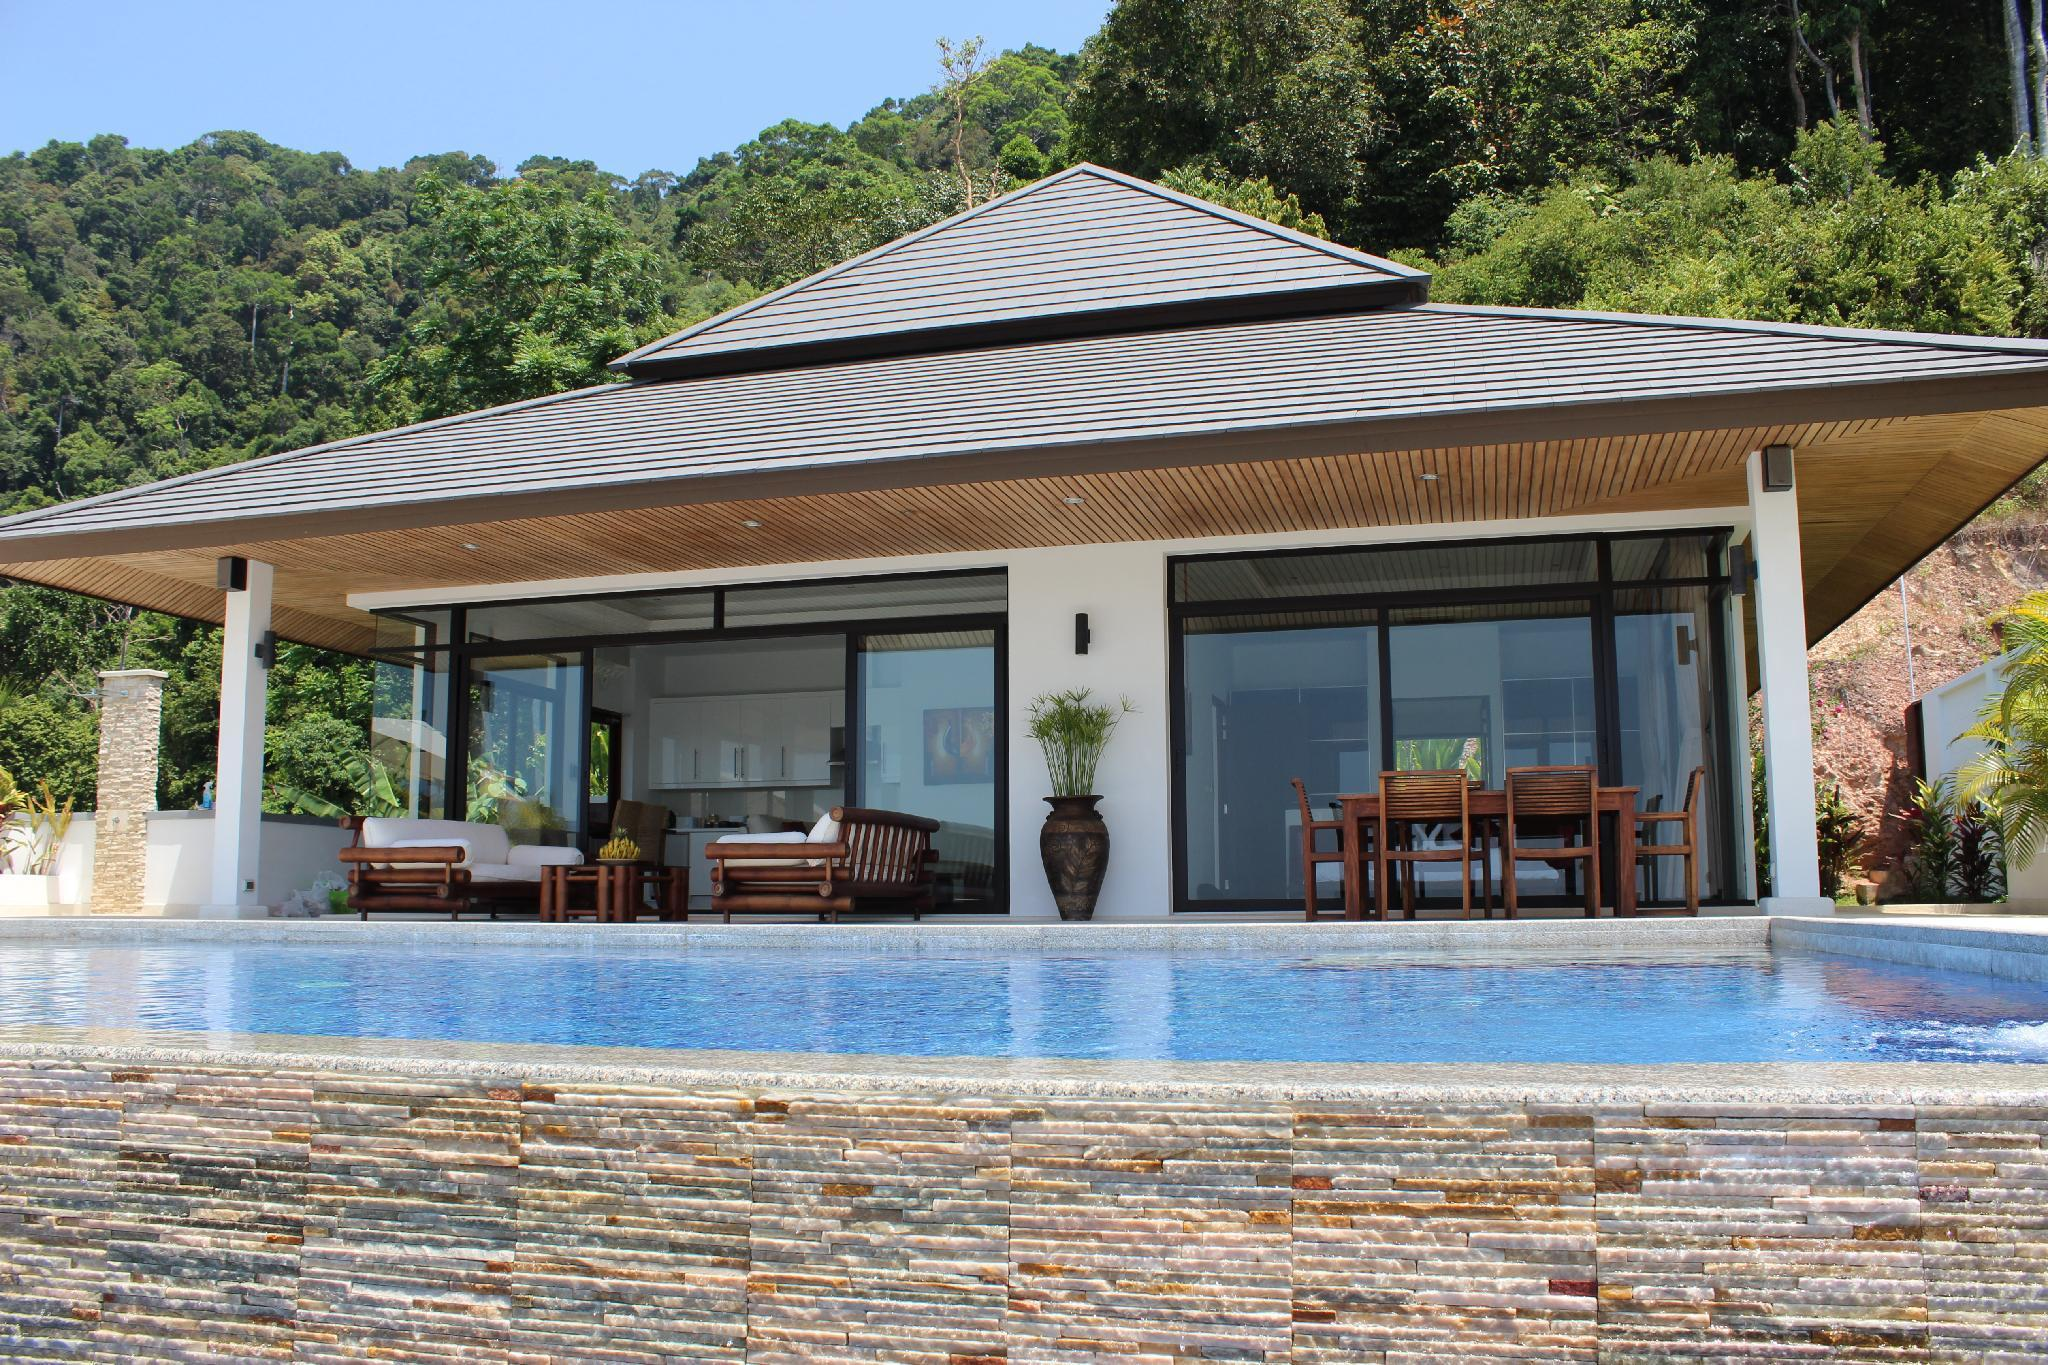 Kulraya Villas - Luxury Serviced Pool Villas วิลลา 2 ห้องนอน 2 ห้องน้ำส่วนตัว ขนาด 400 ตร.ม. – หาดพระแอะ